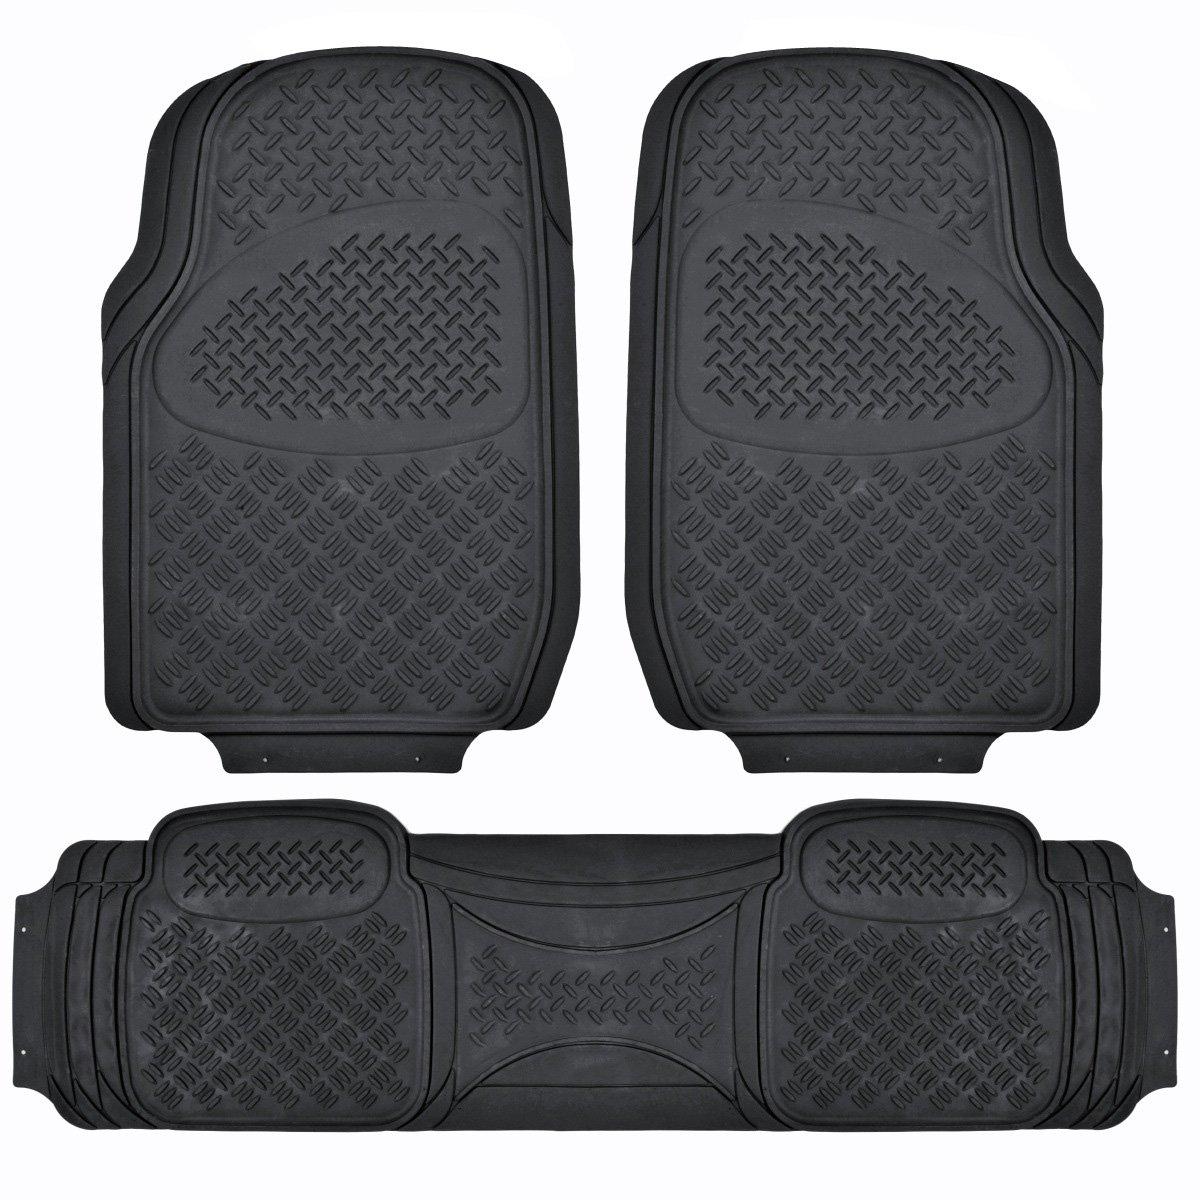 Rubber floor mats denver - Bdk Maxduty Rubber Floor Mat For Car Suv Van Truck Super Heavy Duty Rubber Trim To Fit 3 Piece Black